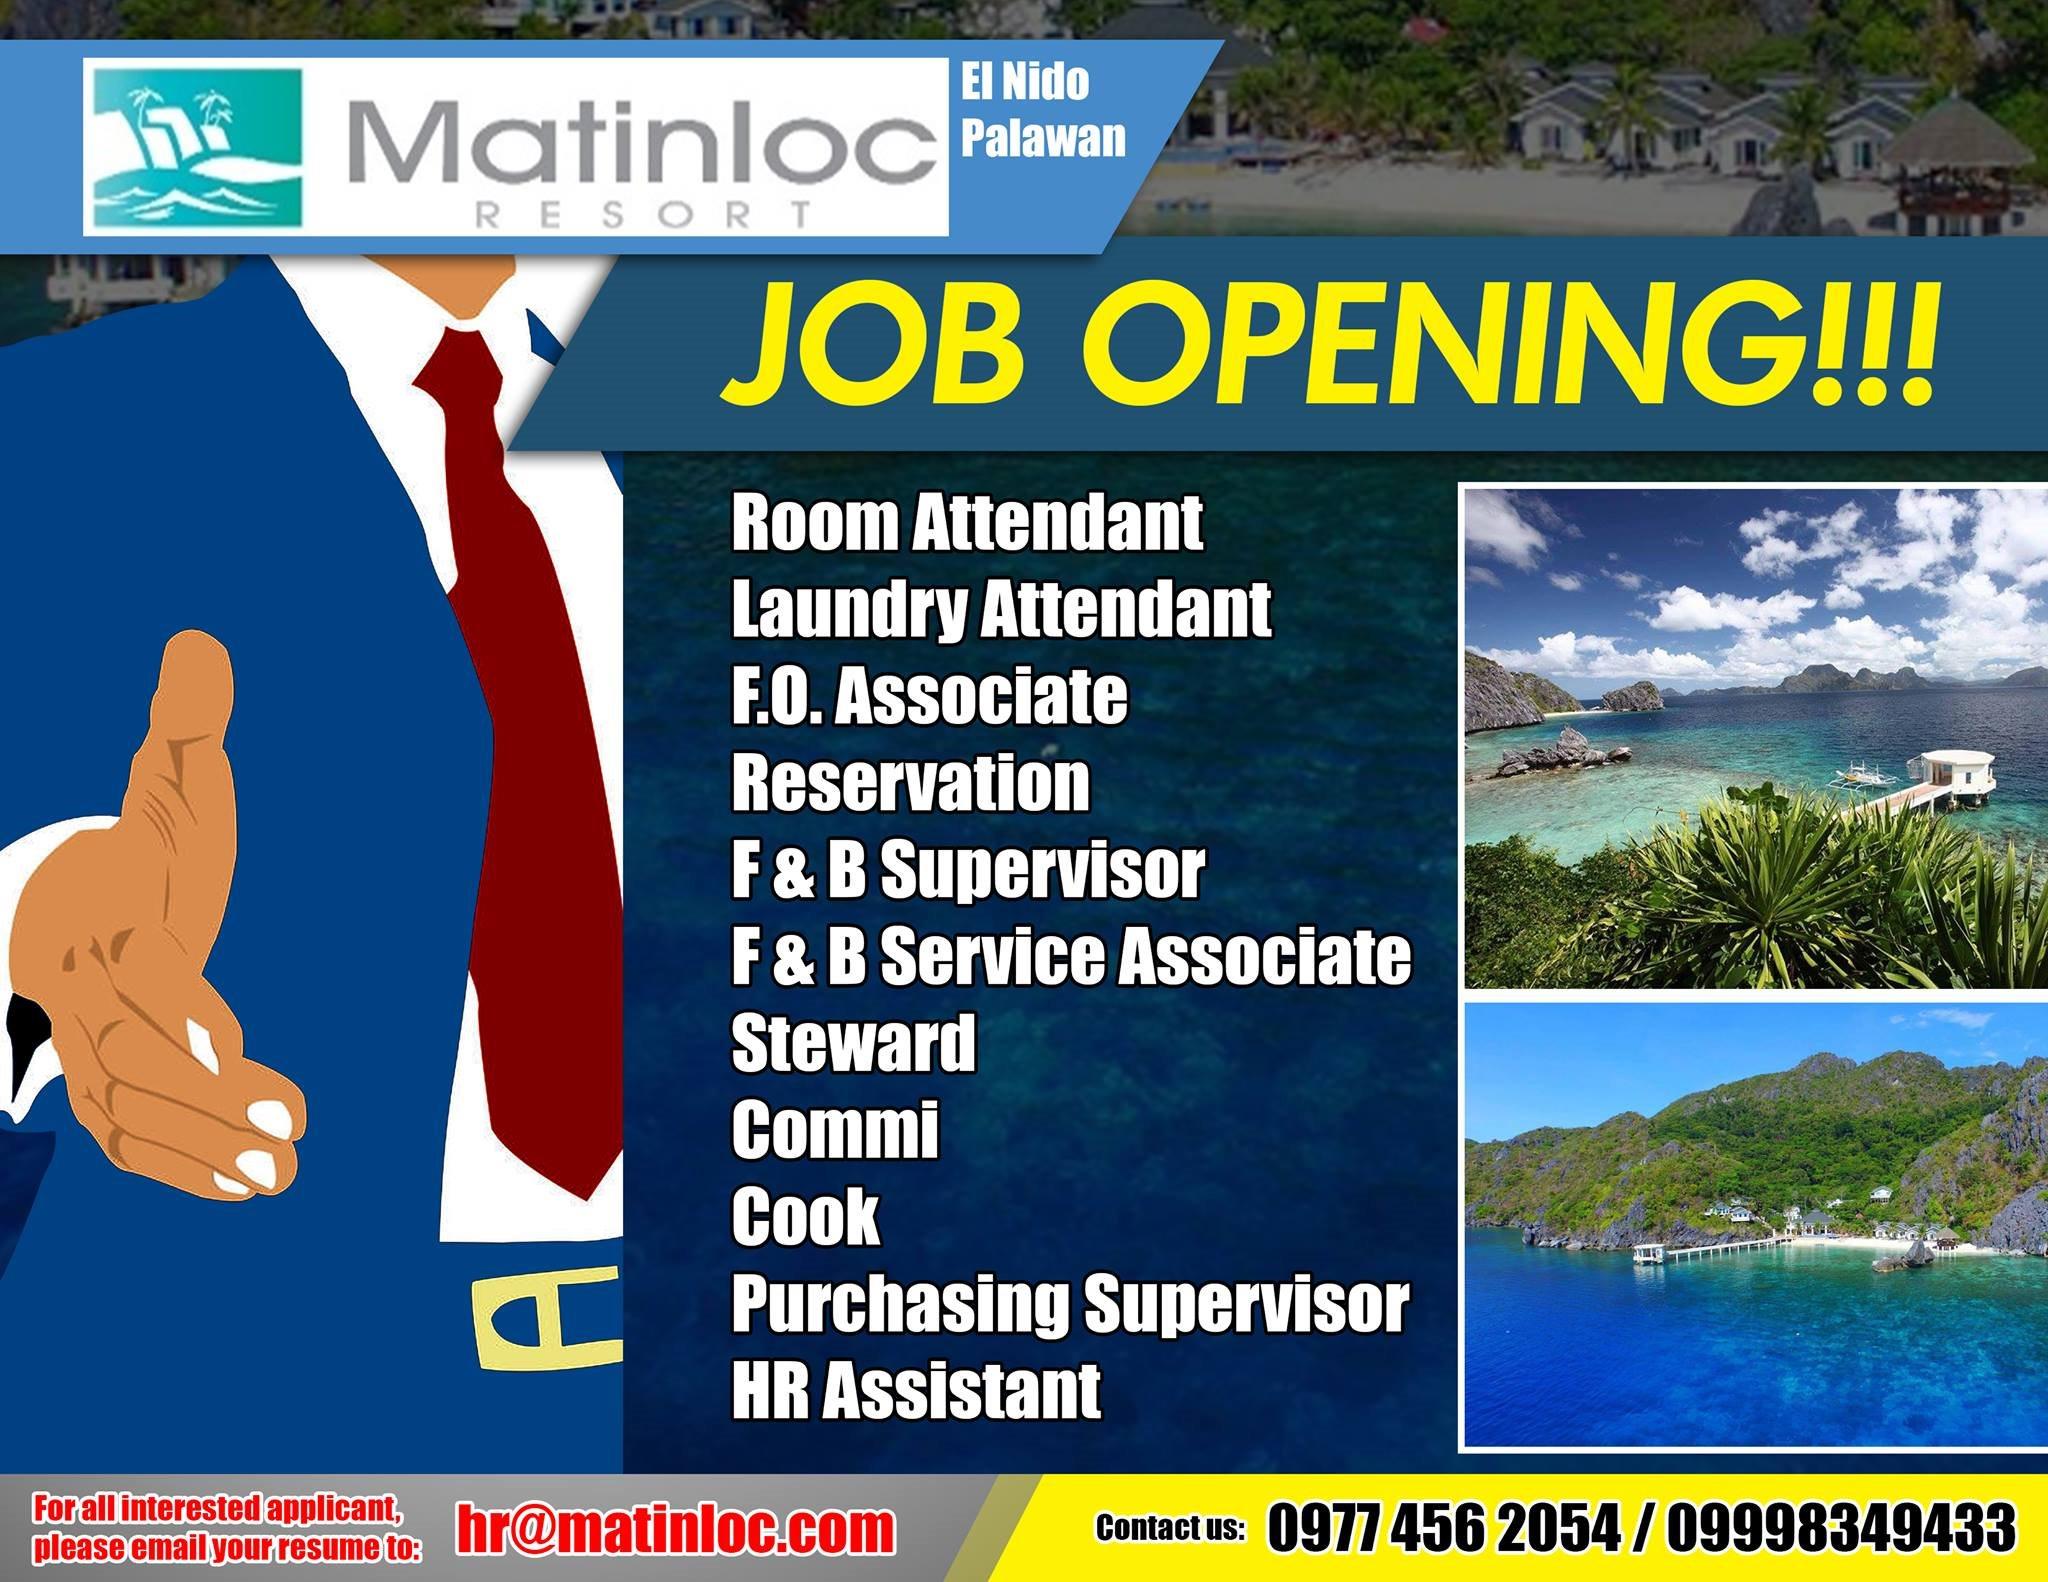 Matinloc Resort Elnido Palawan